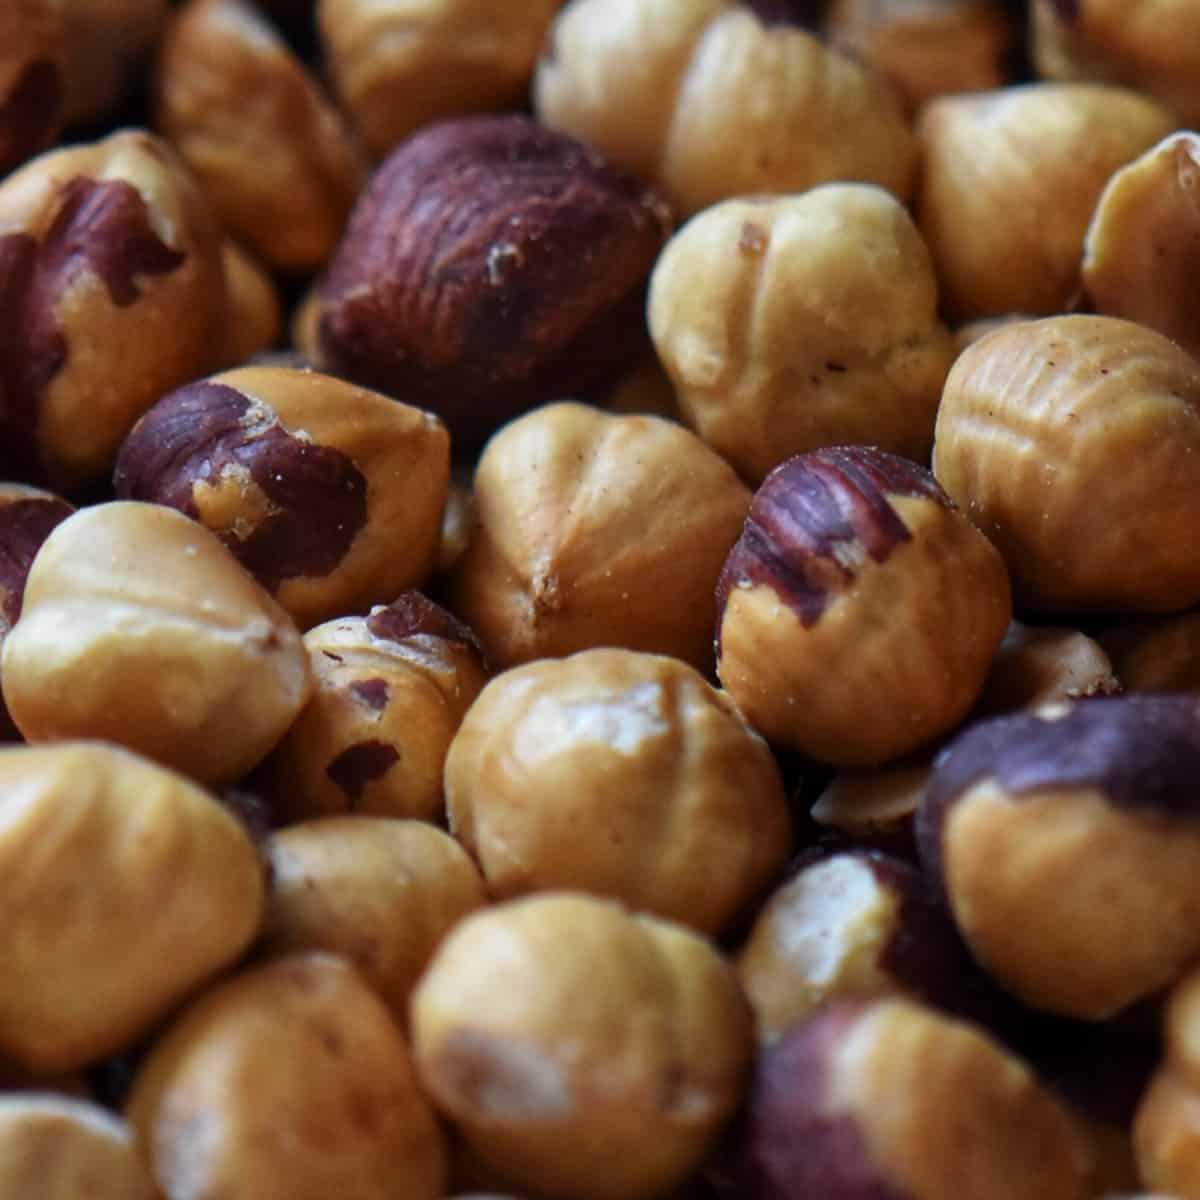 A close up of roasted hazelnuts.